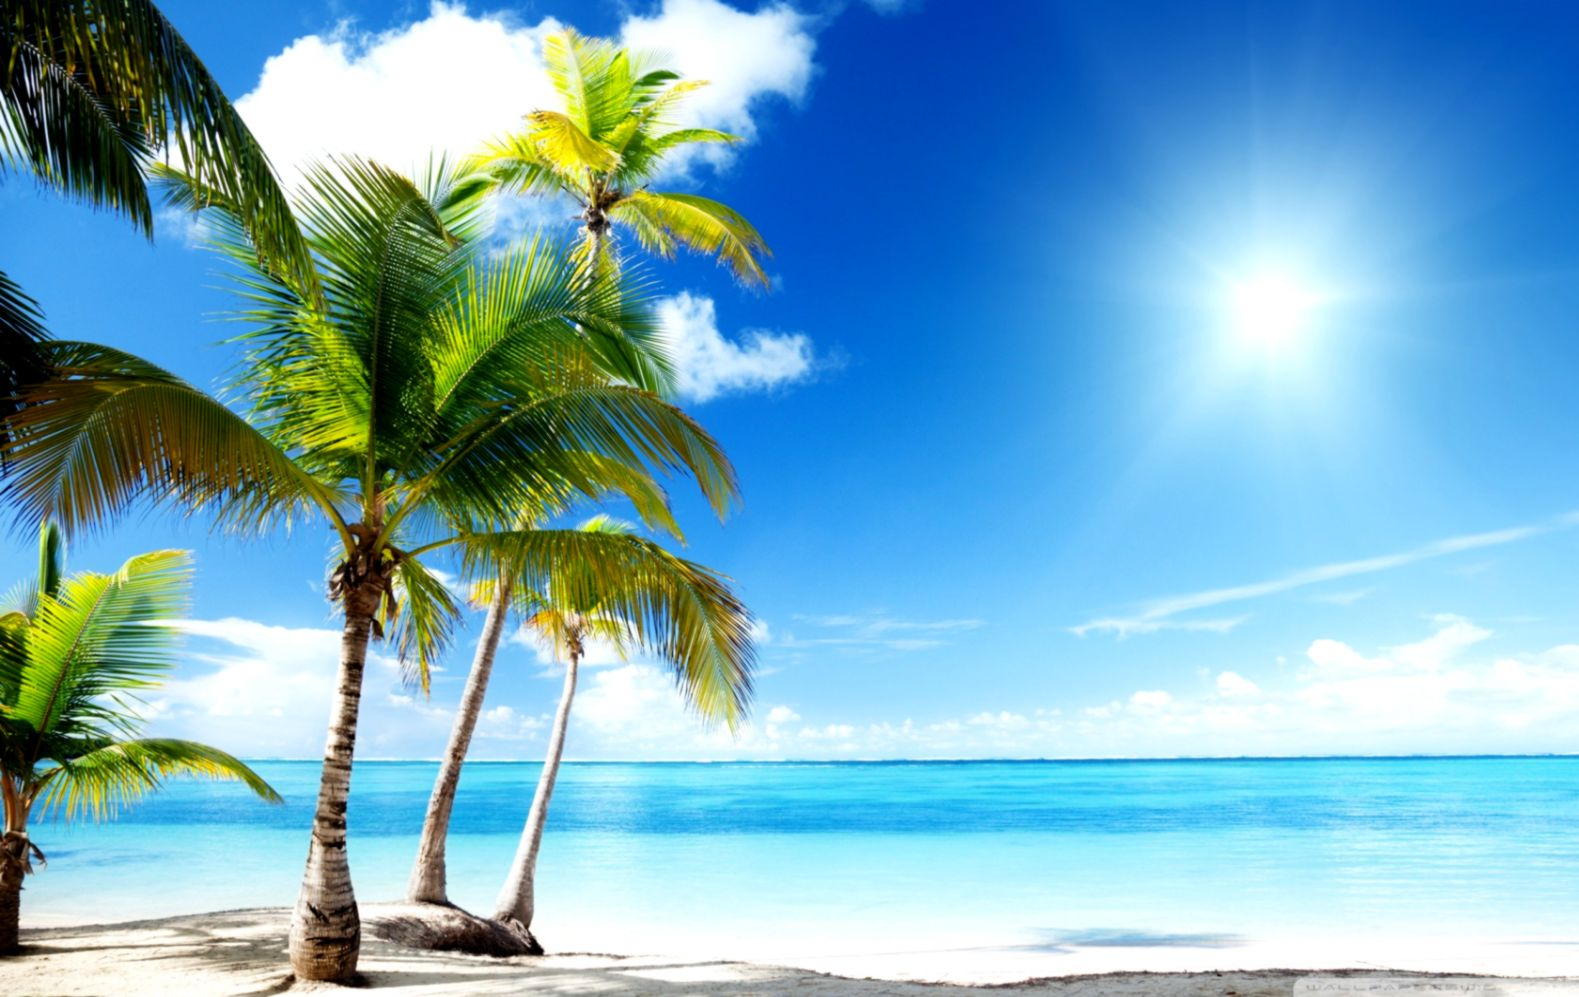 Free Tropical Beach Wallpapers Desktop | Decor di Design free